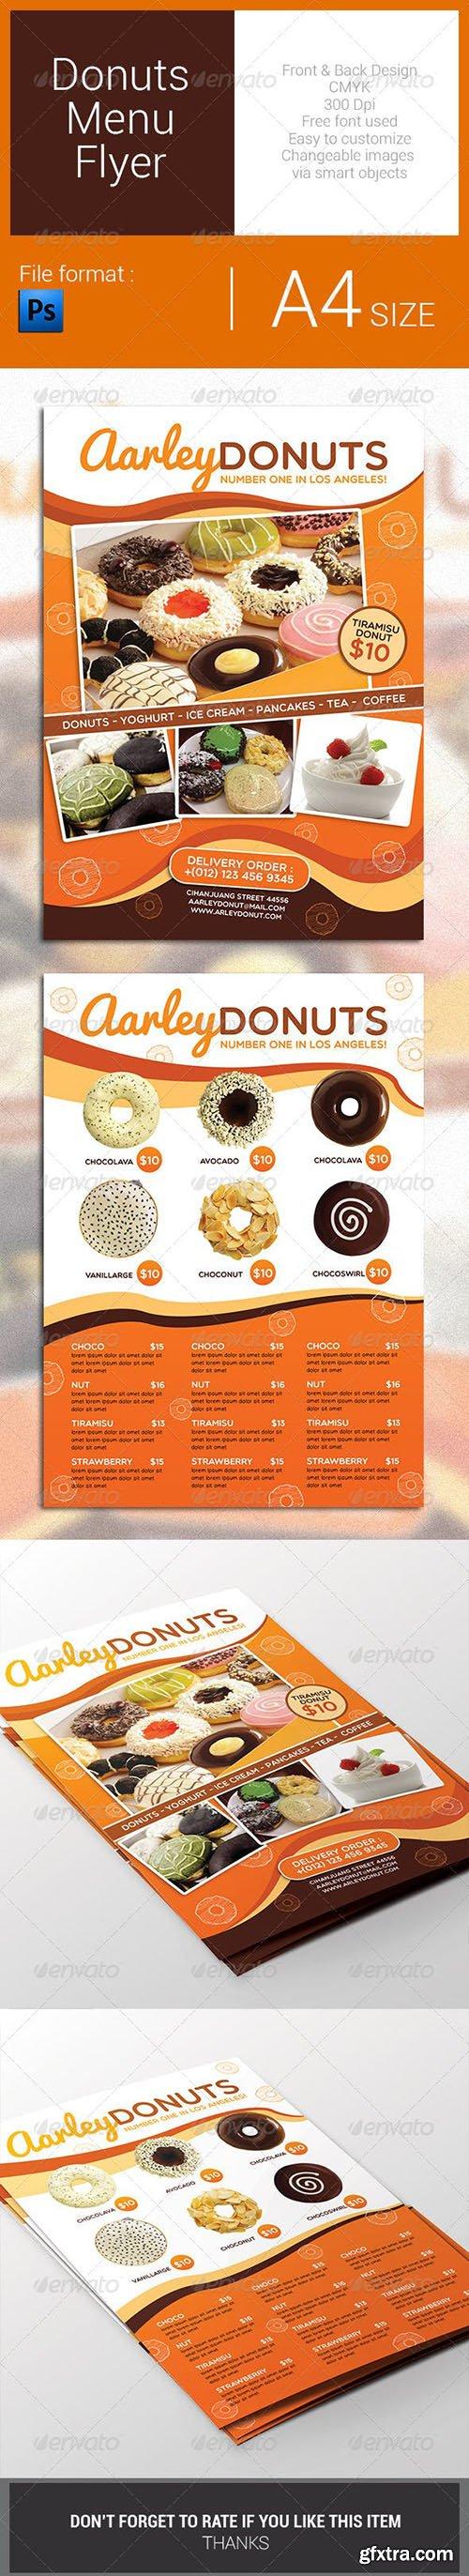 Donuts Menu Flyer 7823541